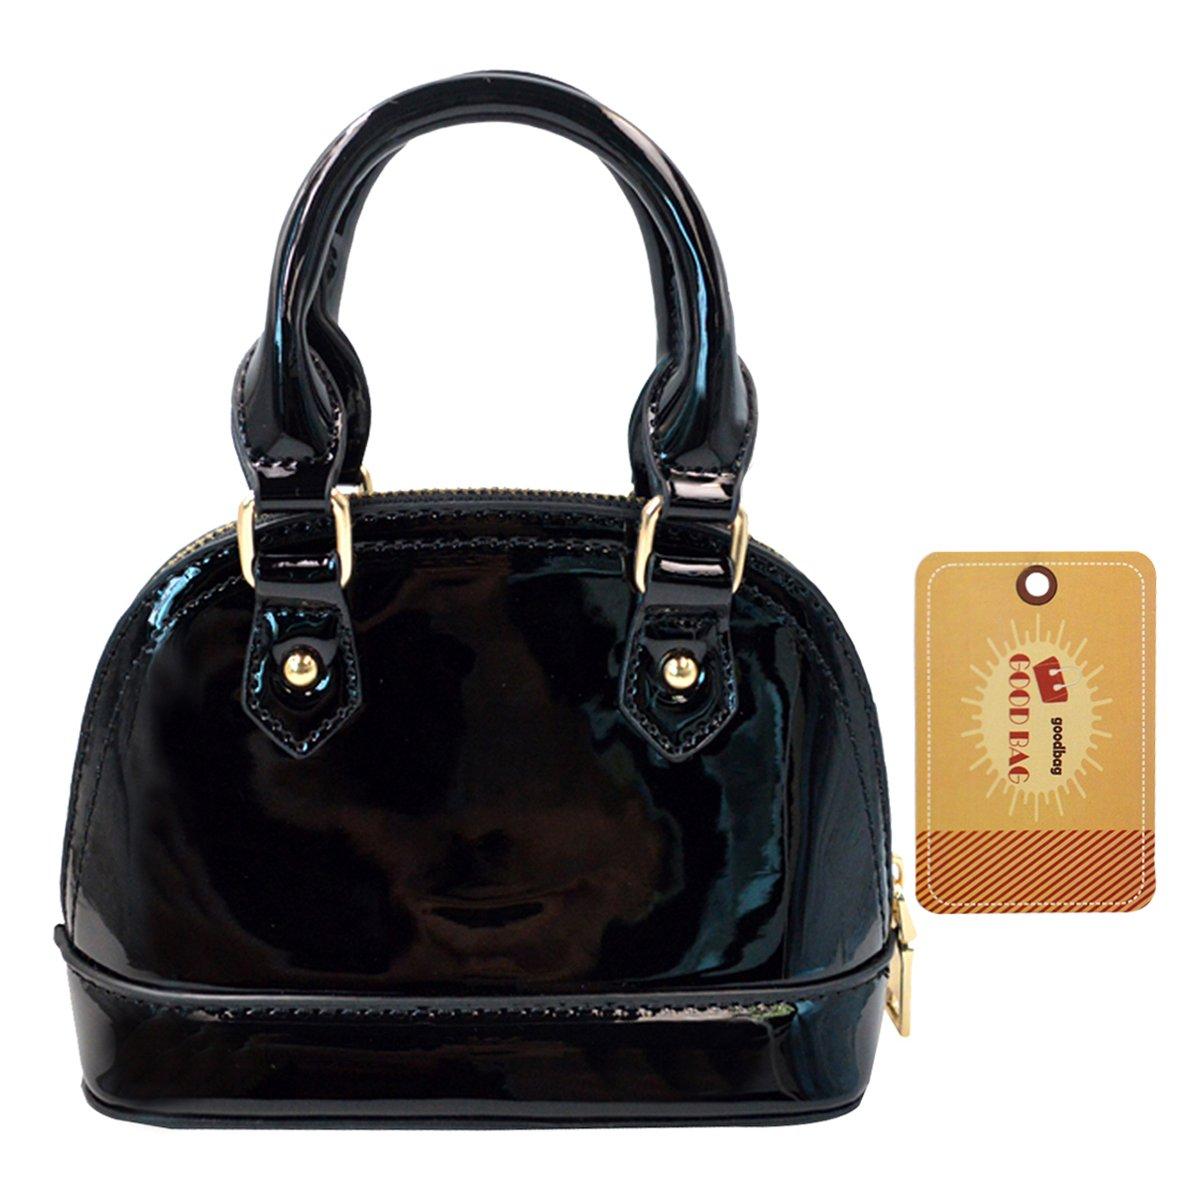 Goodbag Boutique Women Fashion Tote Handbag Patent Leather Crossbody Bag Mini Clutch Chain Shoulder Shell Purse Top Handle Bags(Black)